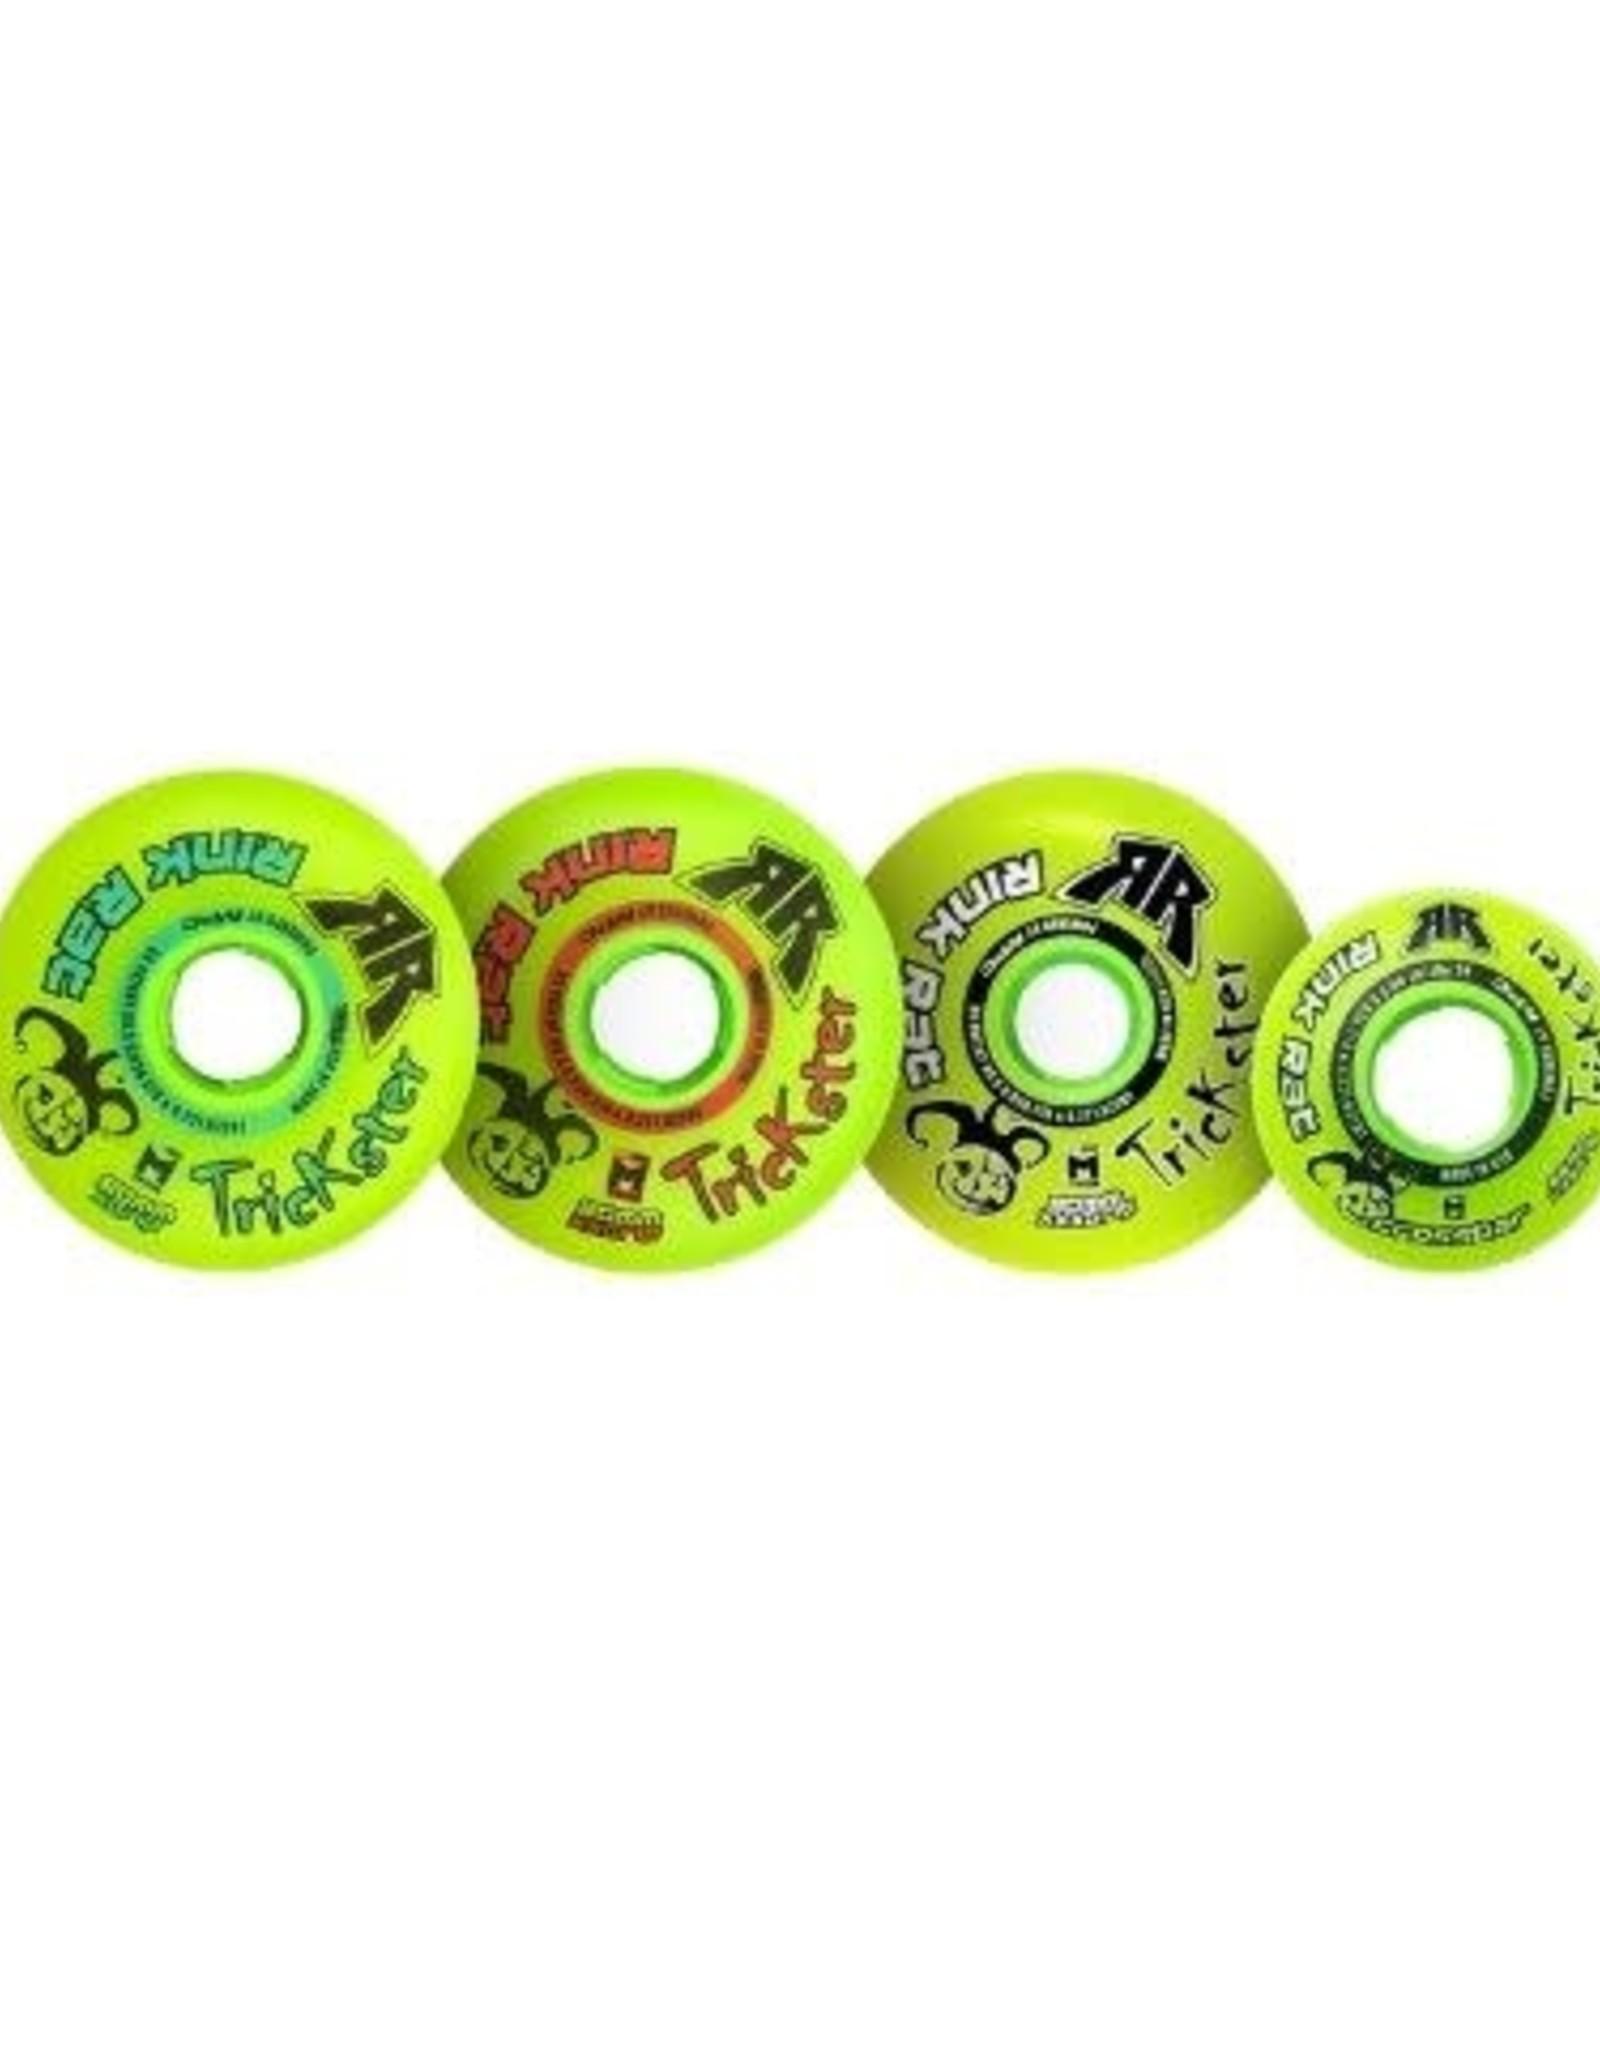 Rink Rat Rink Rat Trickster 59mm Wheel (Yellow) XXX